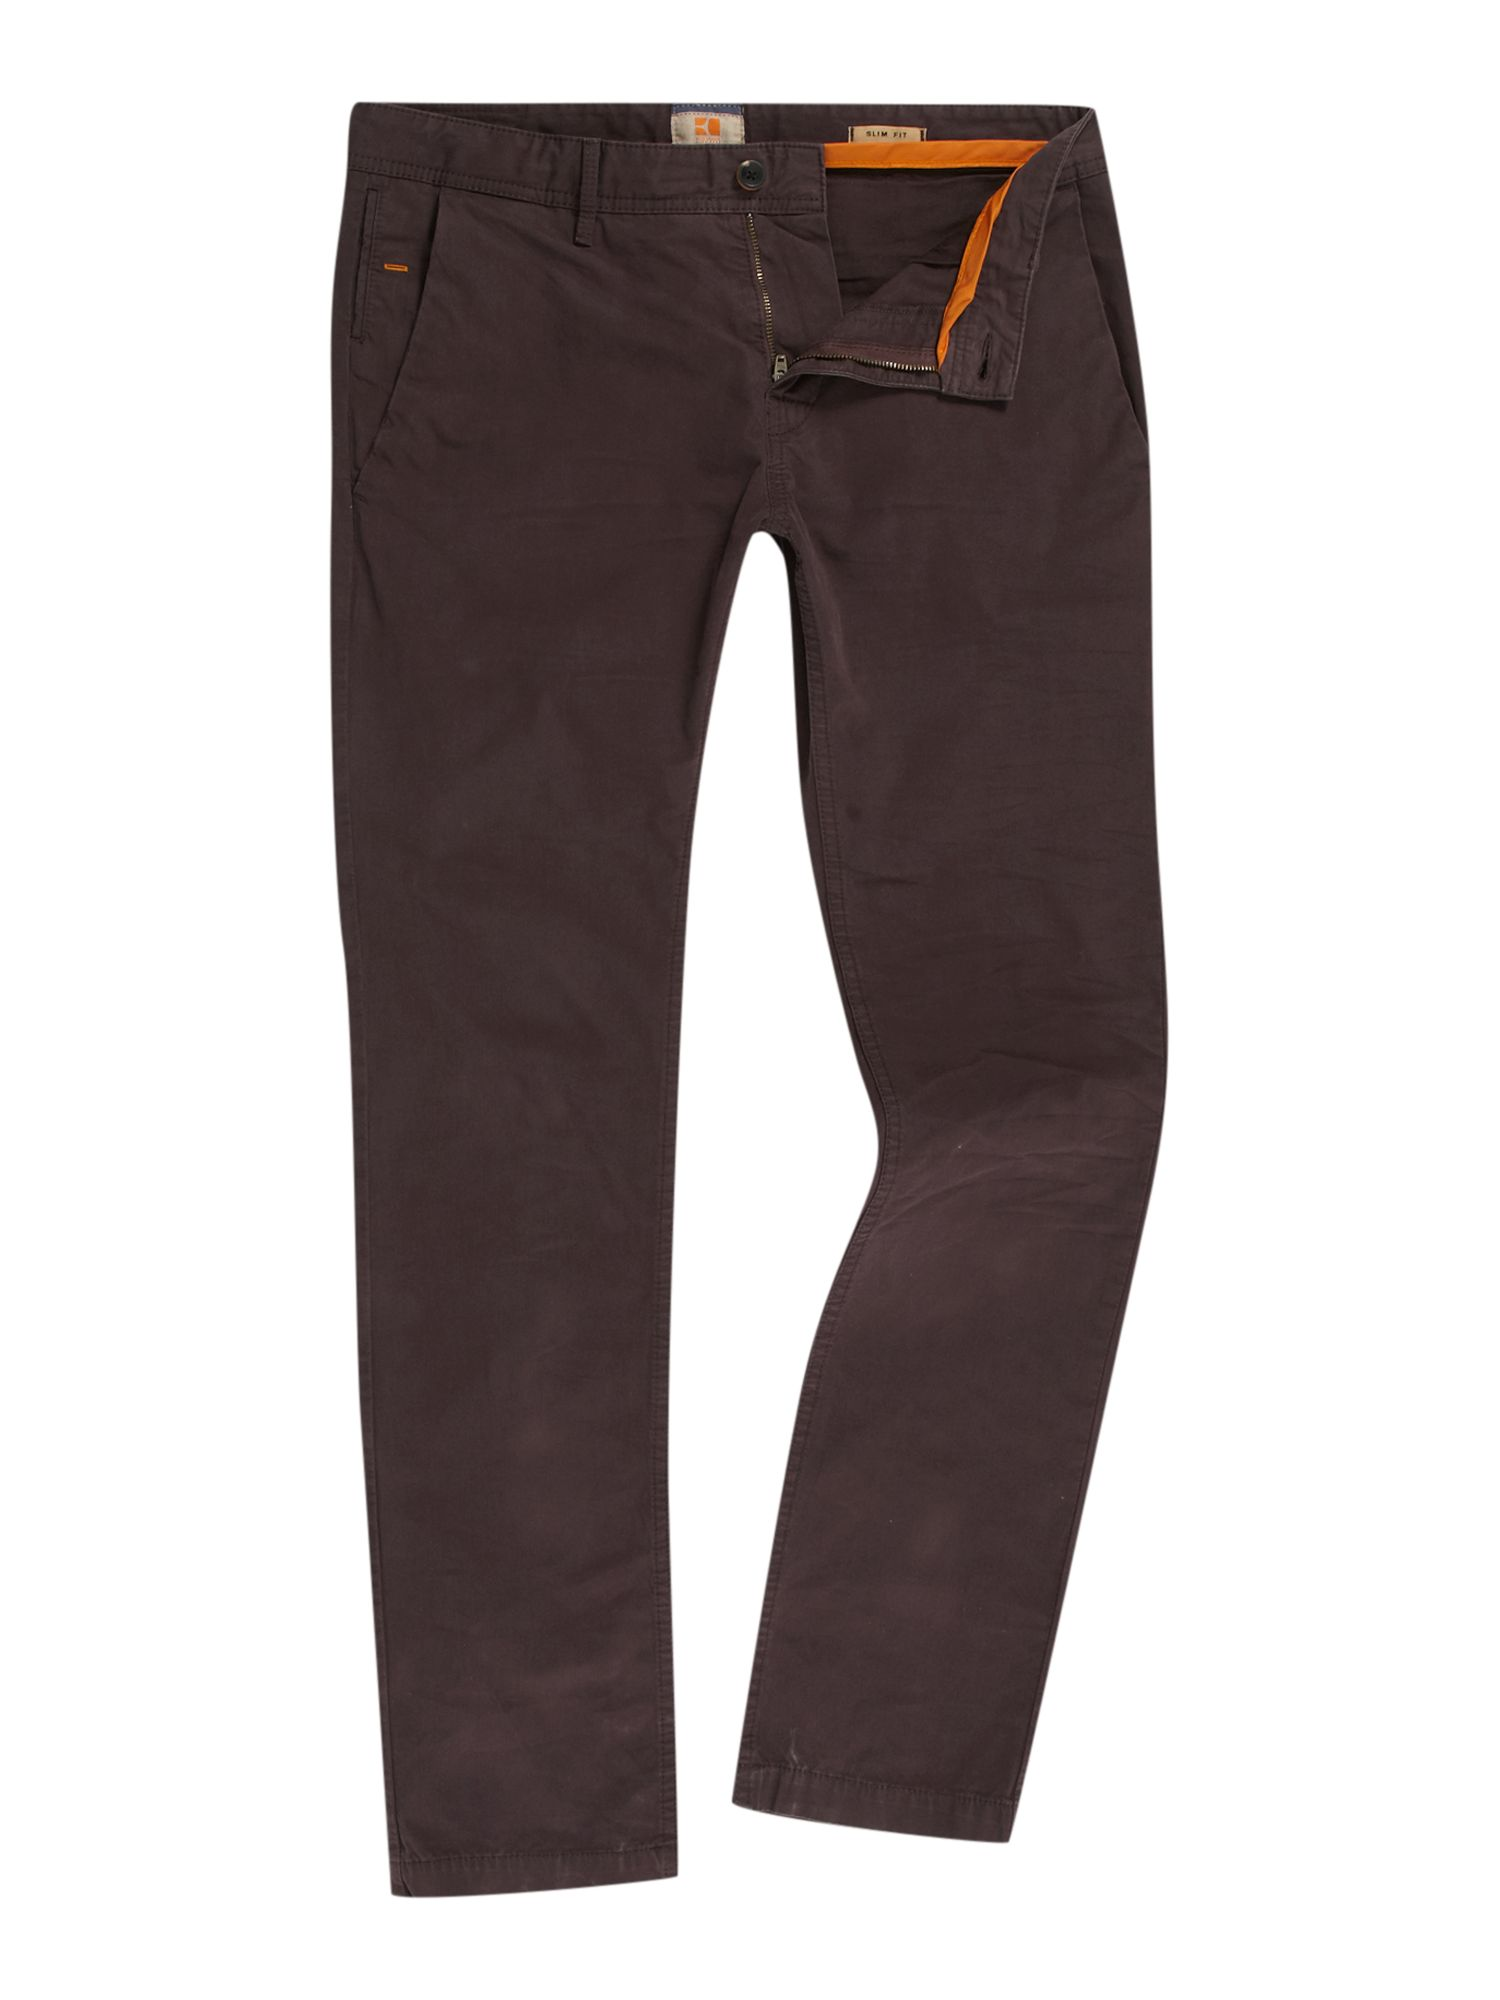 hugo boss schino slim fit chino trousers in purple for men dark purple lyst. Black Bedroom Furniture Sets. Home Design Ideas